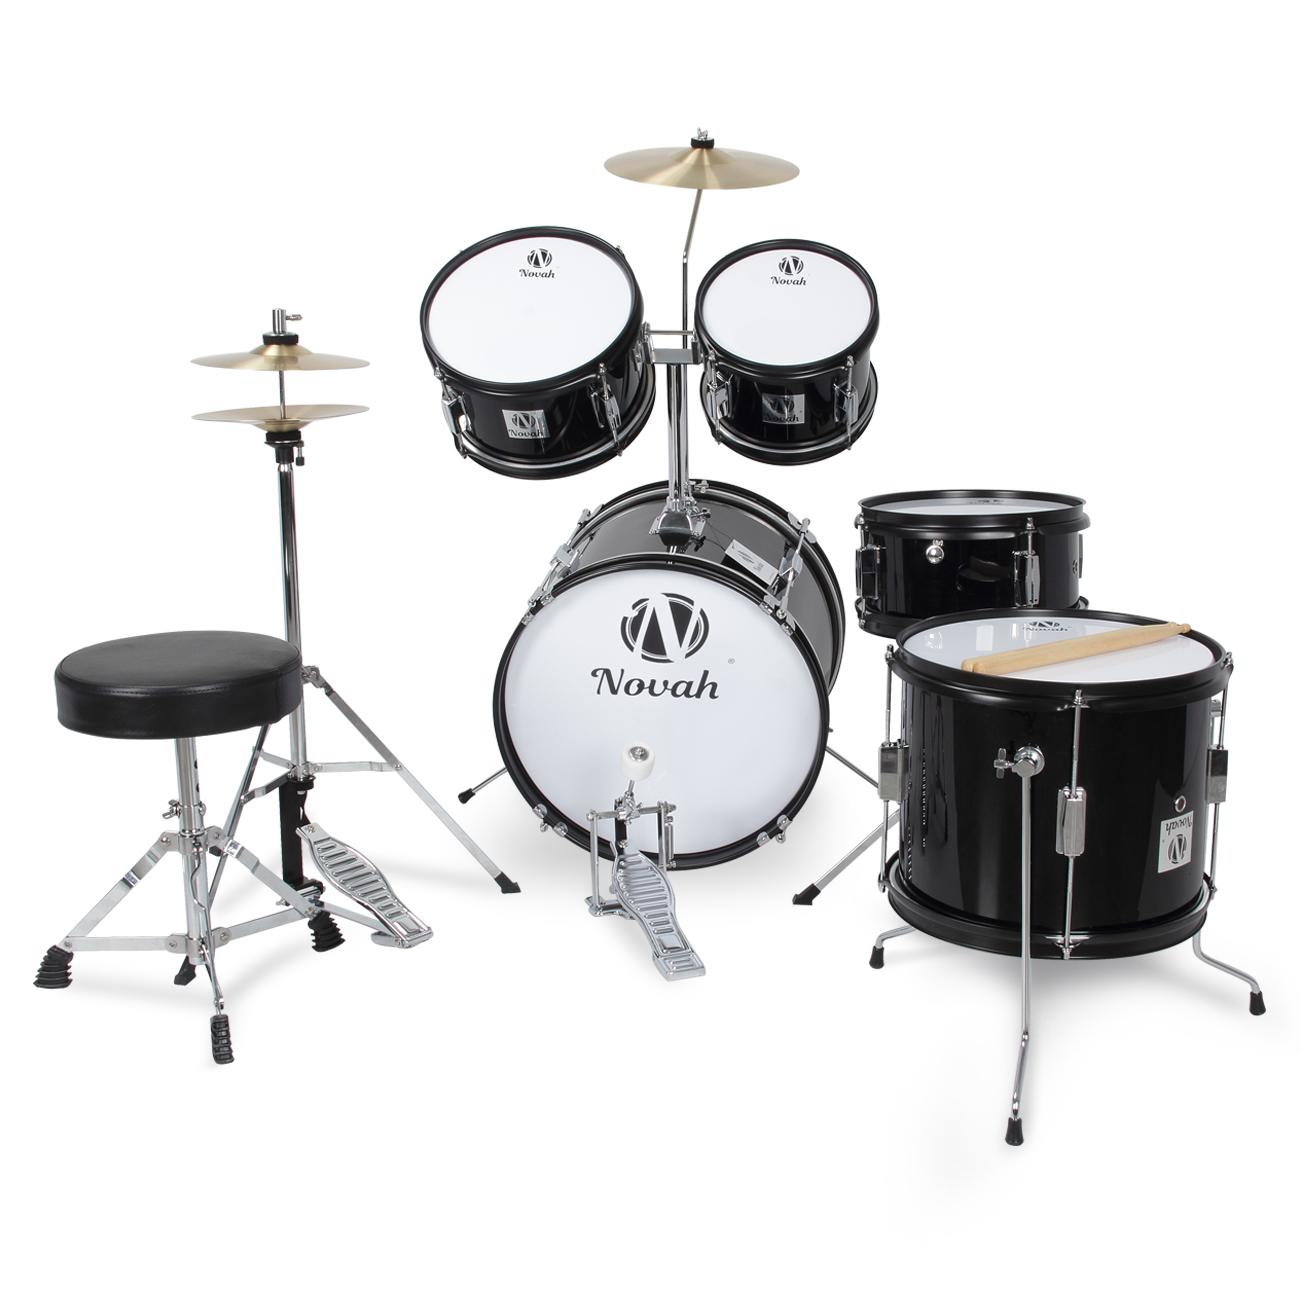 new drum set 5 pc complete junior adult set cymbals full size black and blue ebay. Black Bedroom Furniture Sets. Home Design Ideas